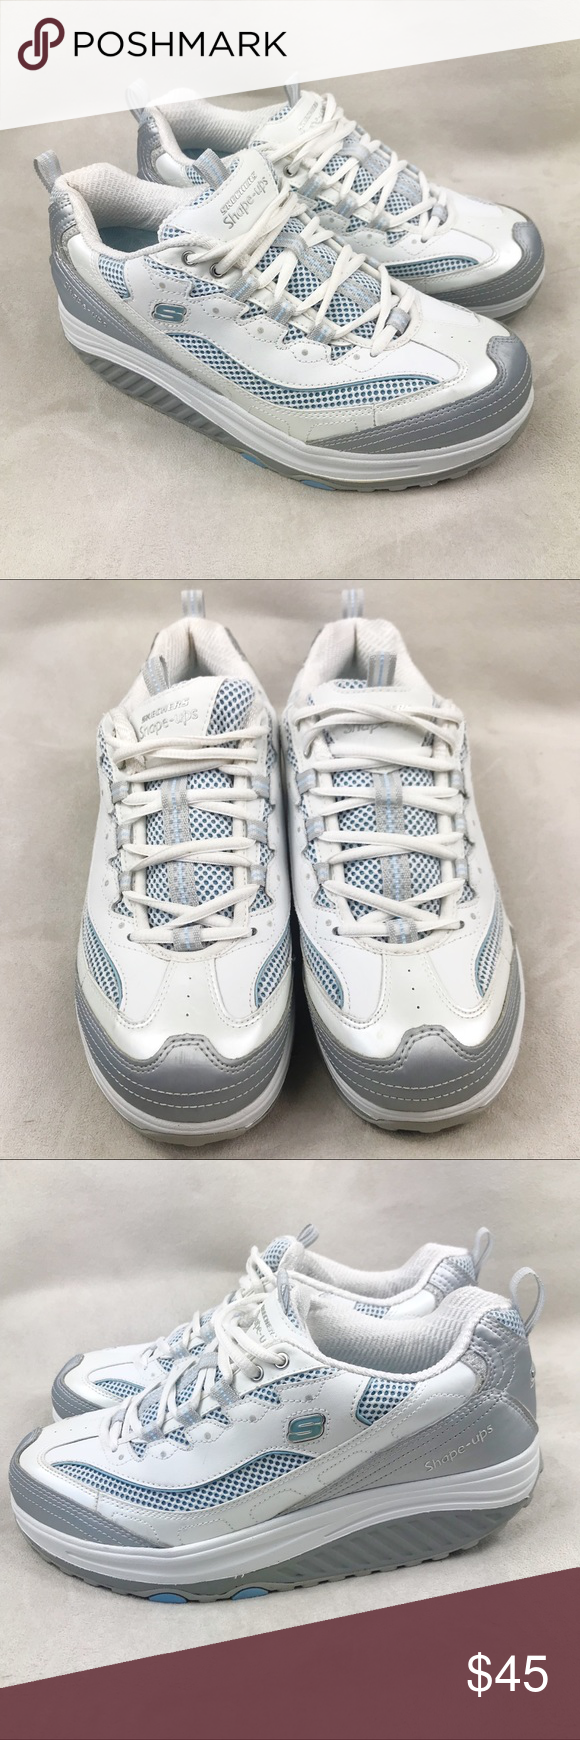 aefdf6054592 Skechers Shape Up Jump Start Walking Sneaker 10 Skechers Shape Up Jump  Start Fitness Walking Sneaker Women s size 10 White with silver